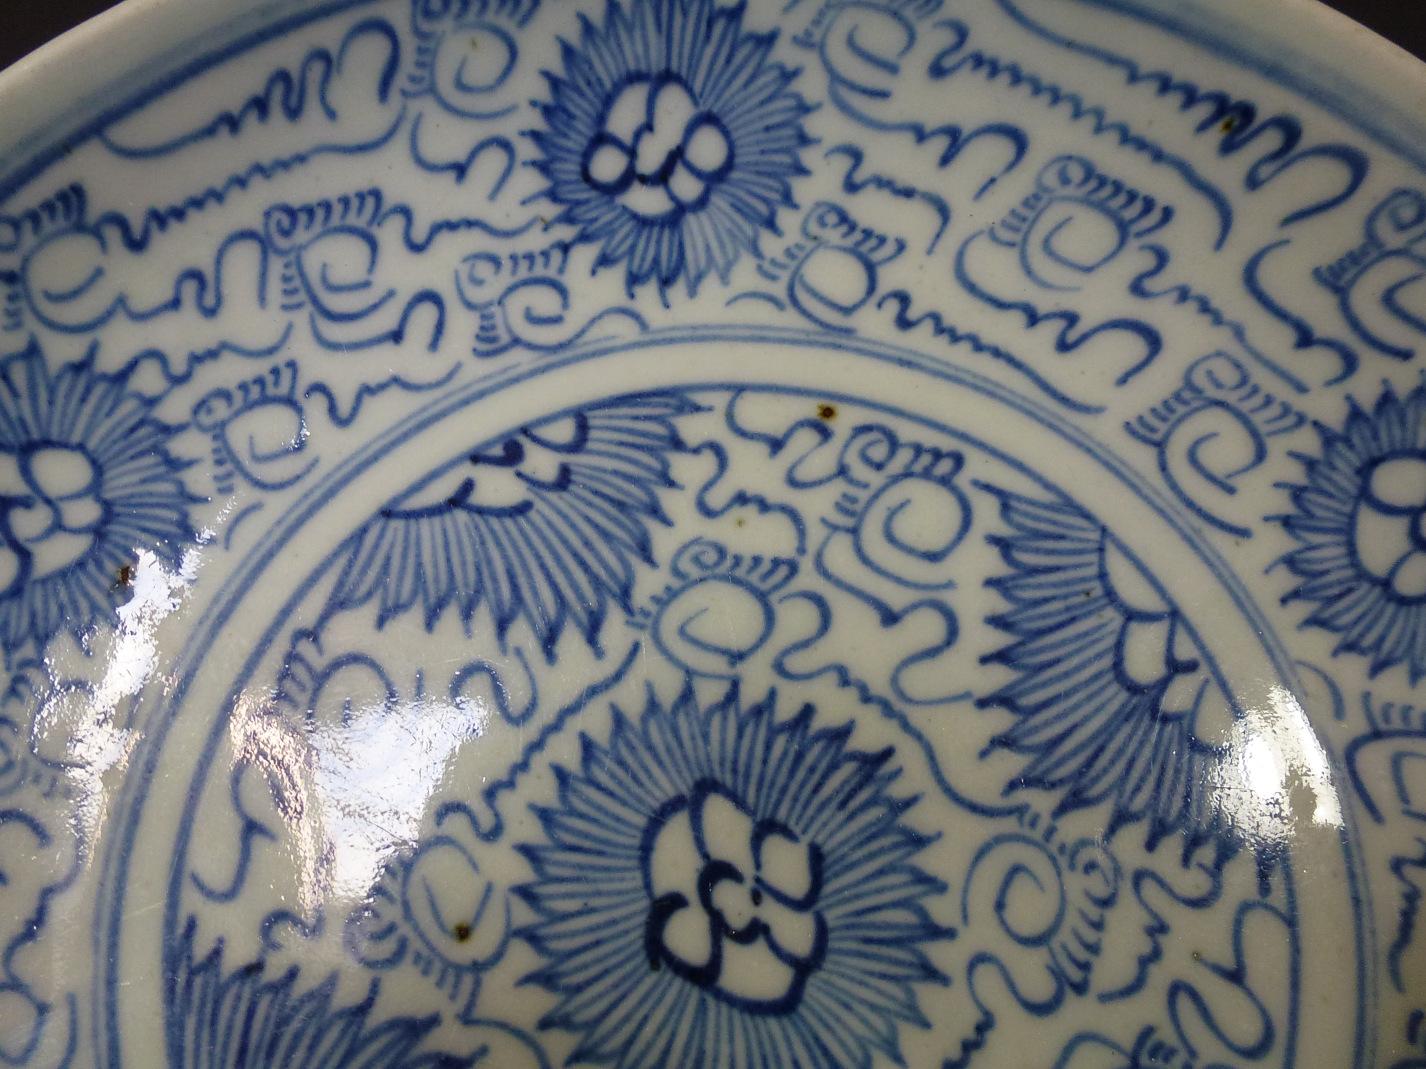 17th/18th C. Arabic Script Charger – Chrysanthemum